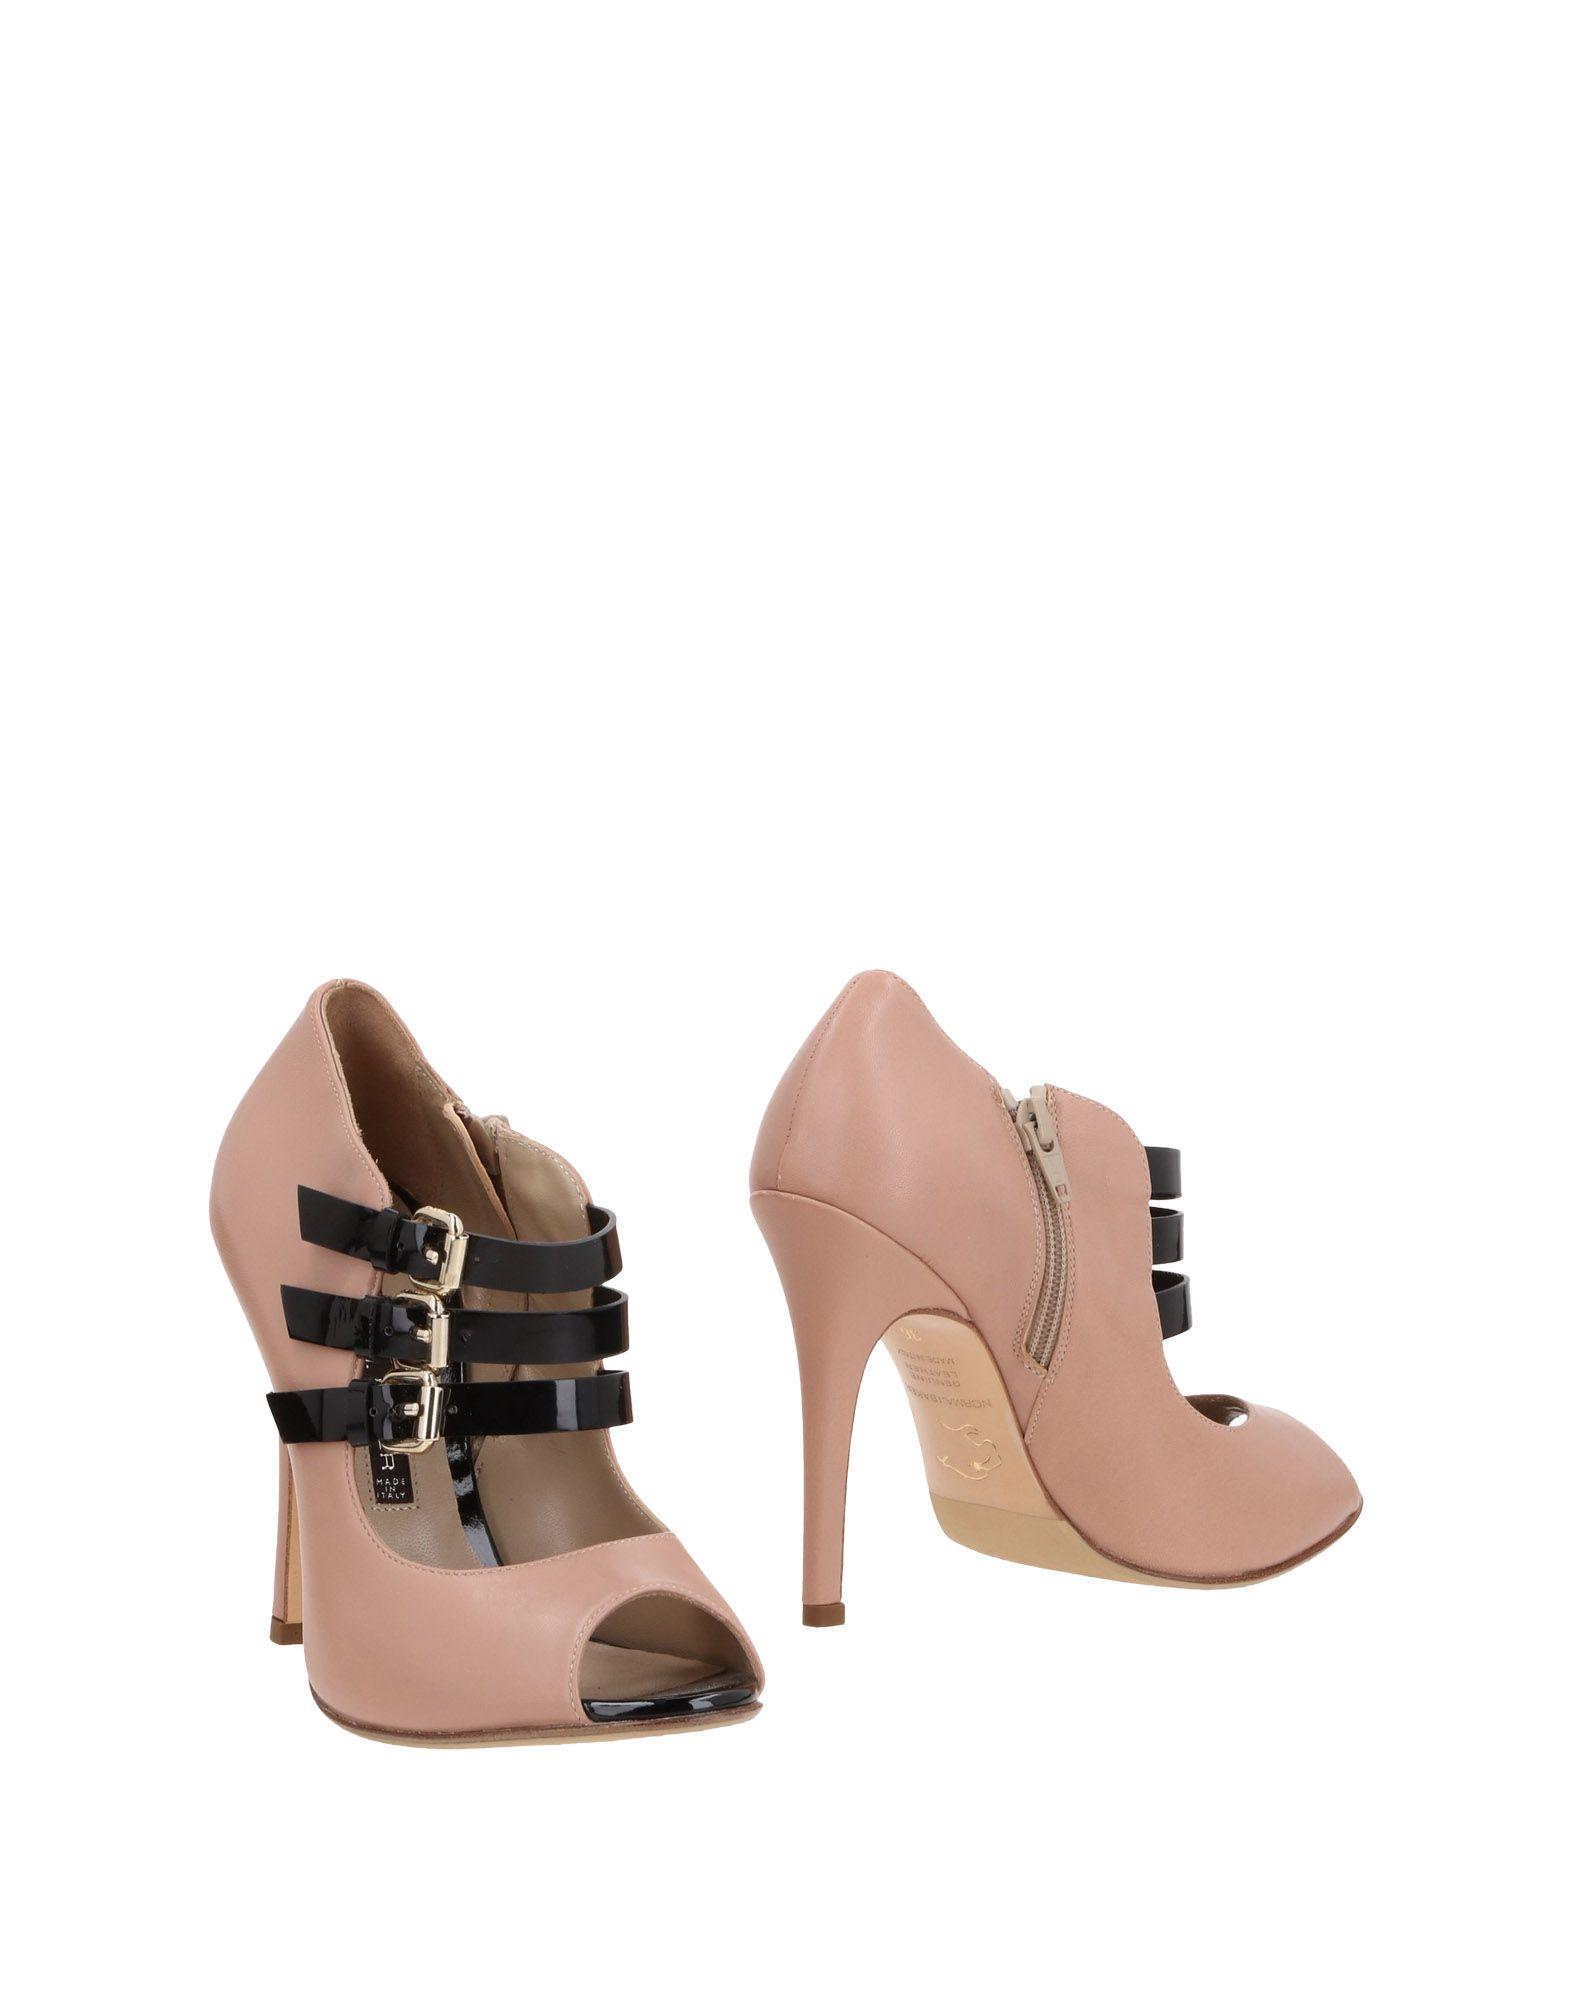 Stilvolle Stiefelette billige Schuhe Norma J.Baker Stiefelette Stilvolle Damen  11461036QI 5a79d5